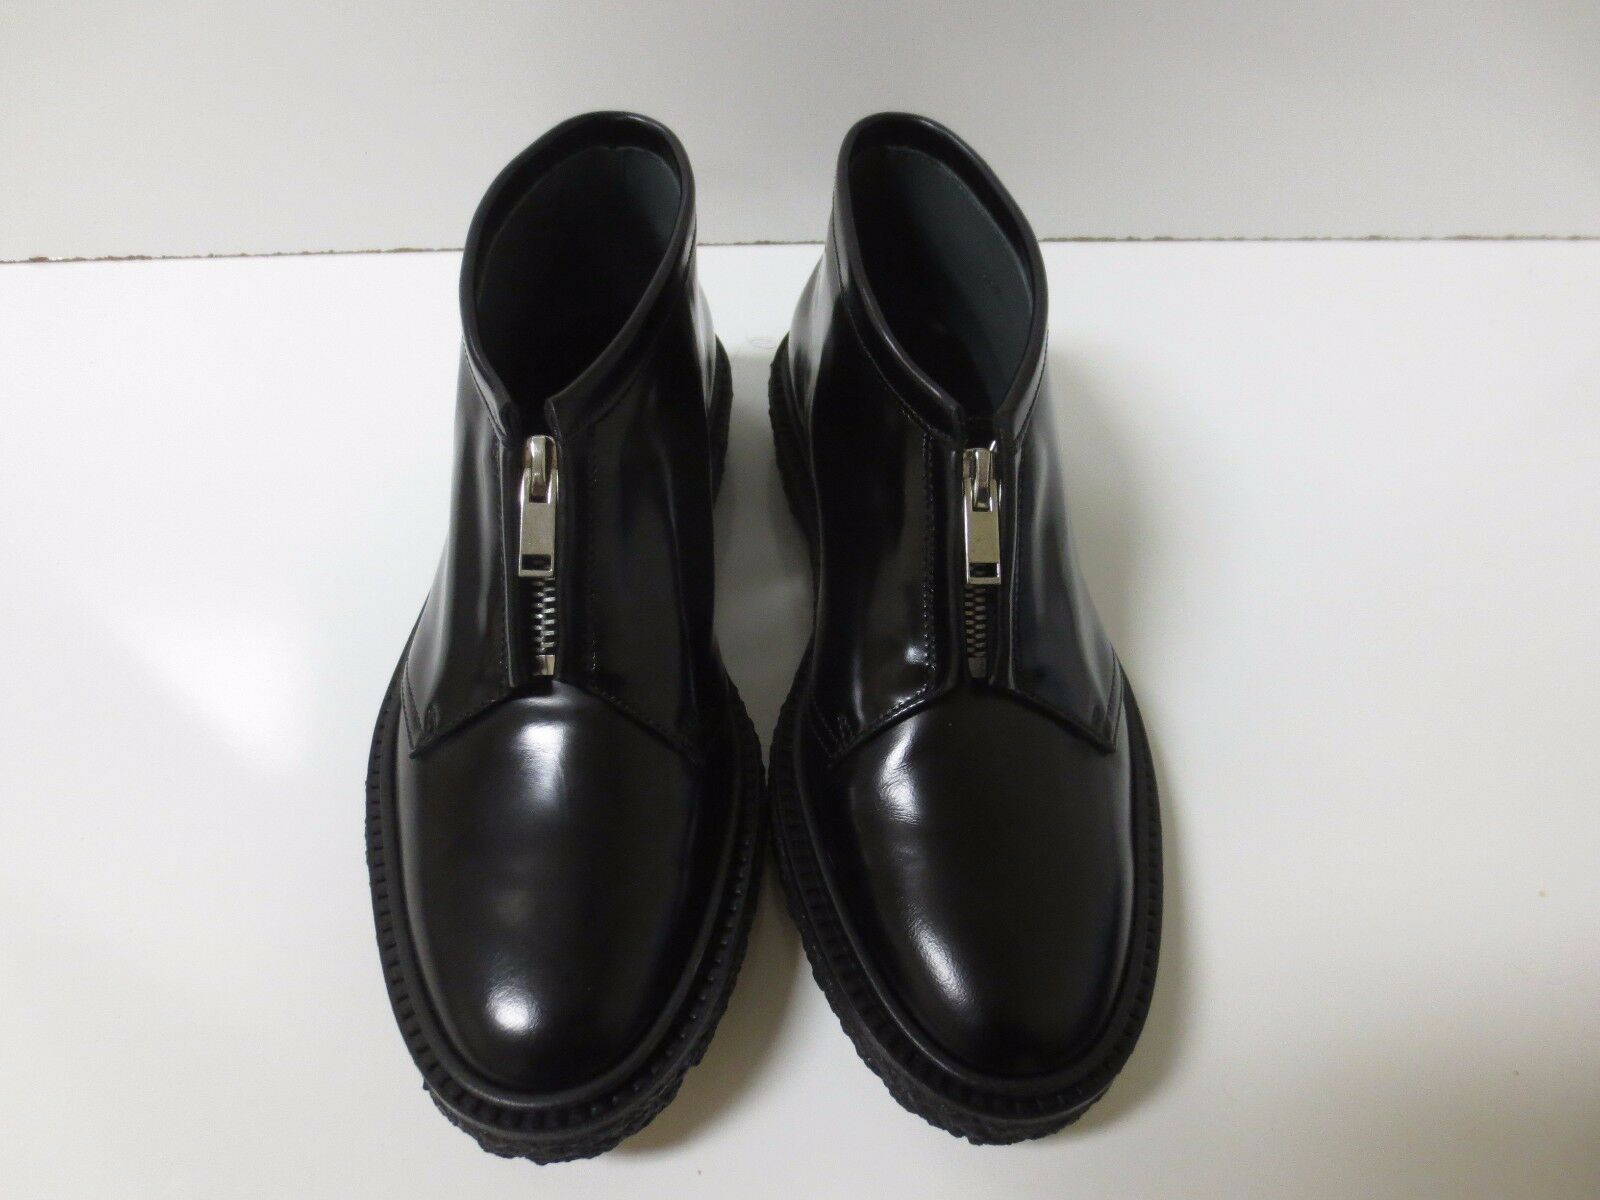 ADIEU PARIS Black Type 3 Zip Front Chukka Boot shoes Flats FR 36.5 NEW BOX  575